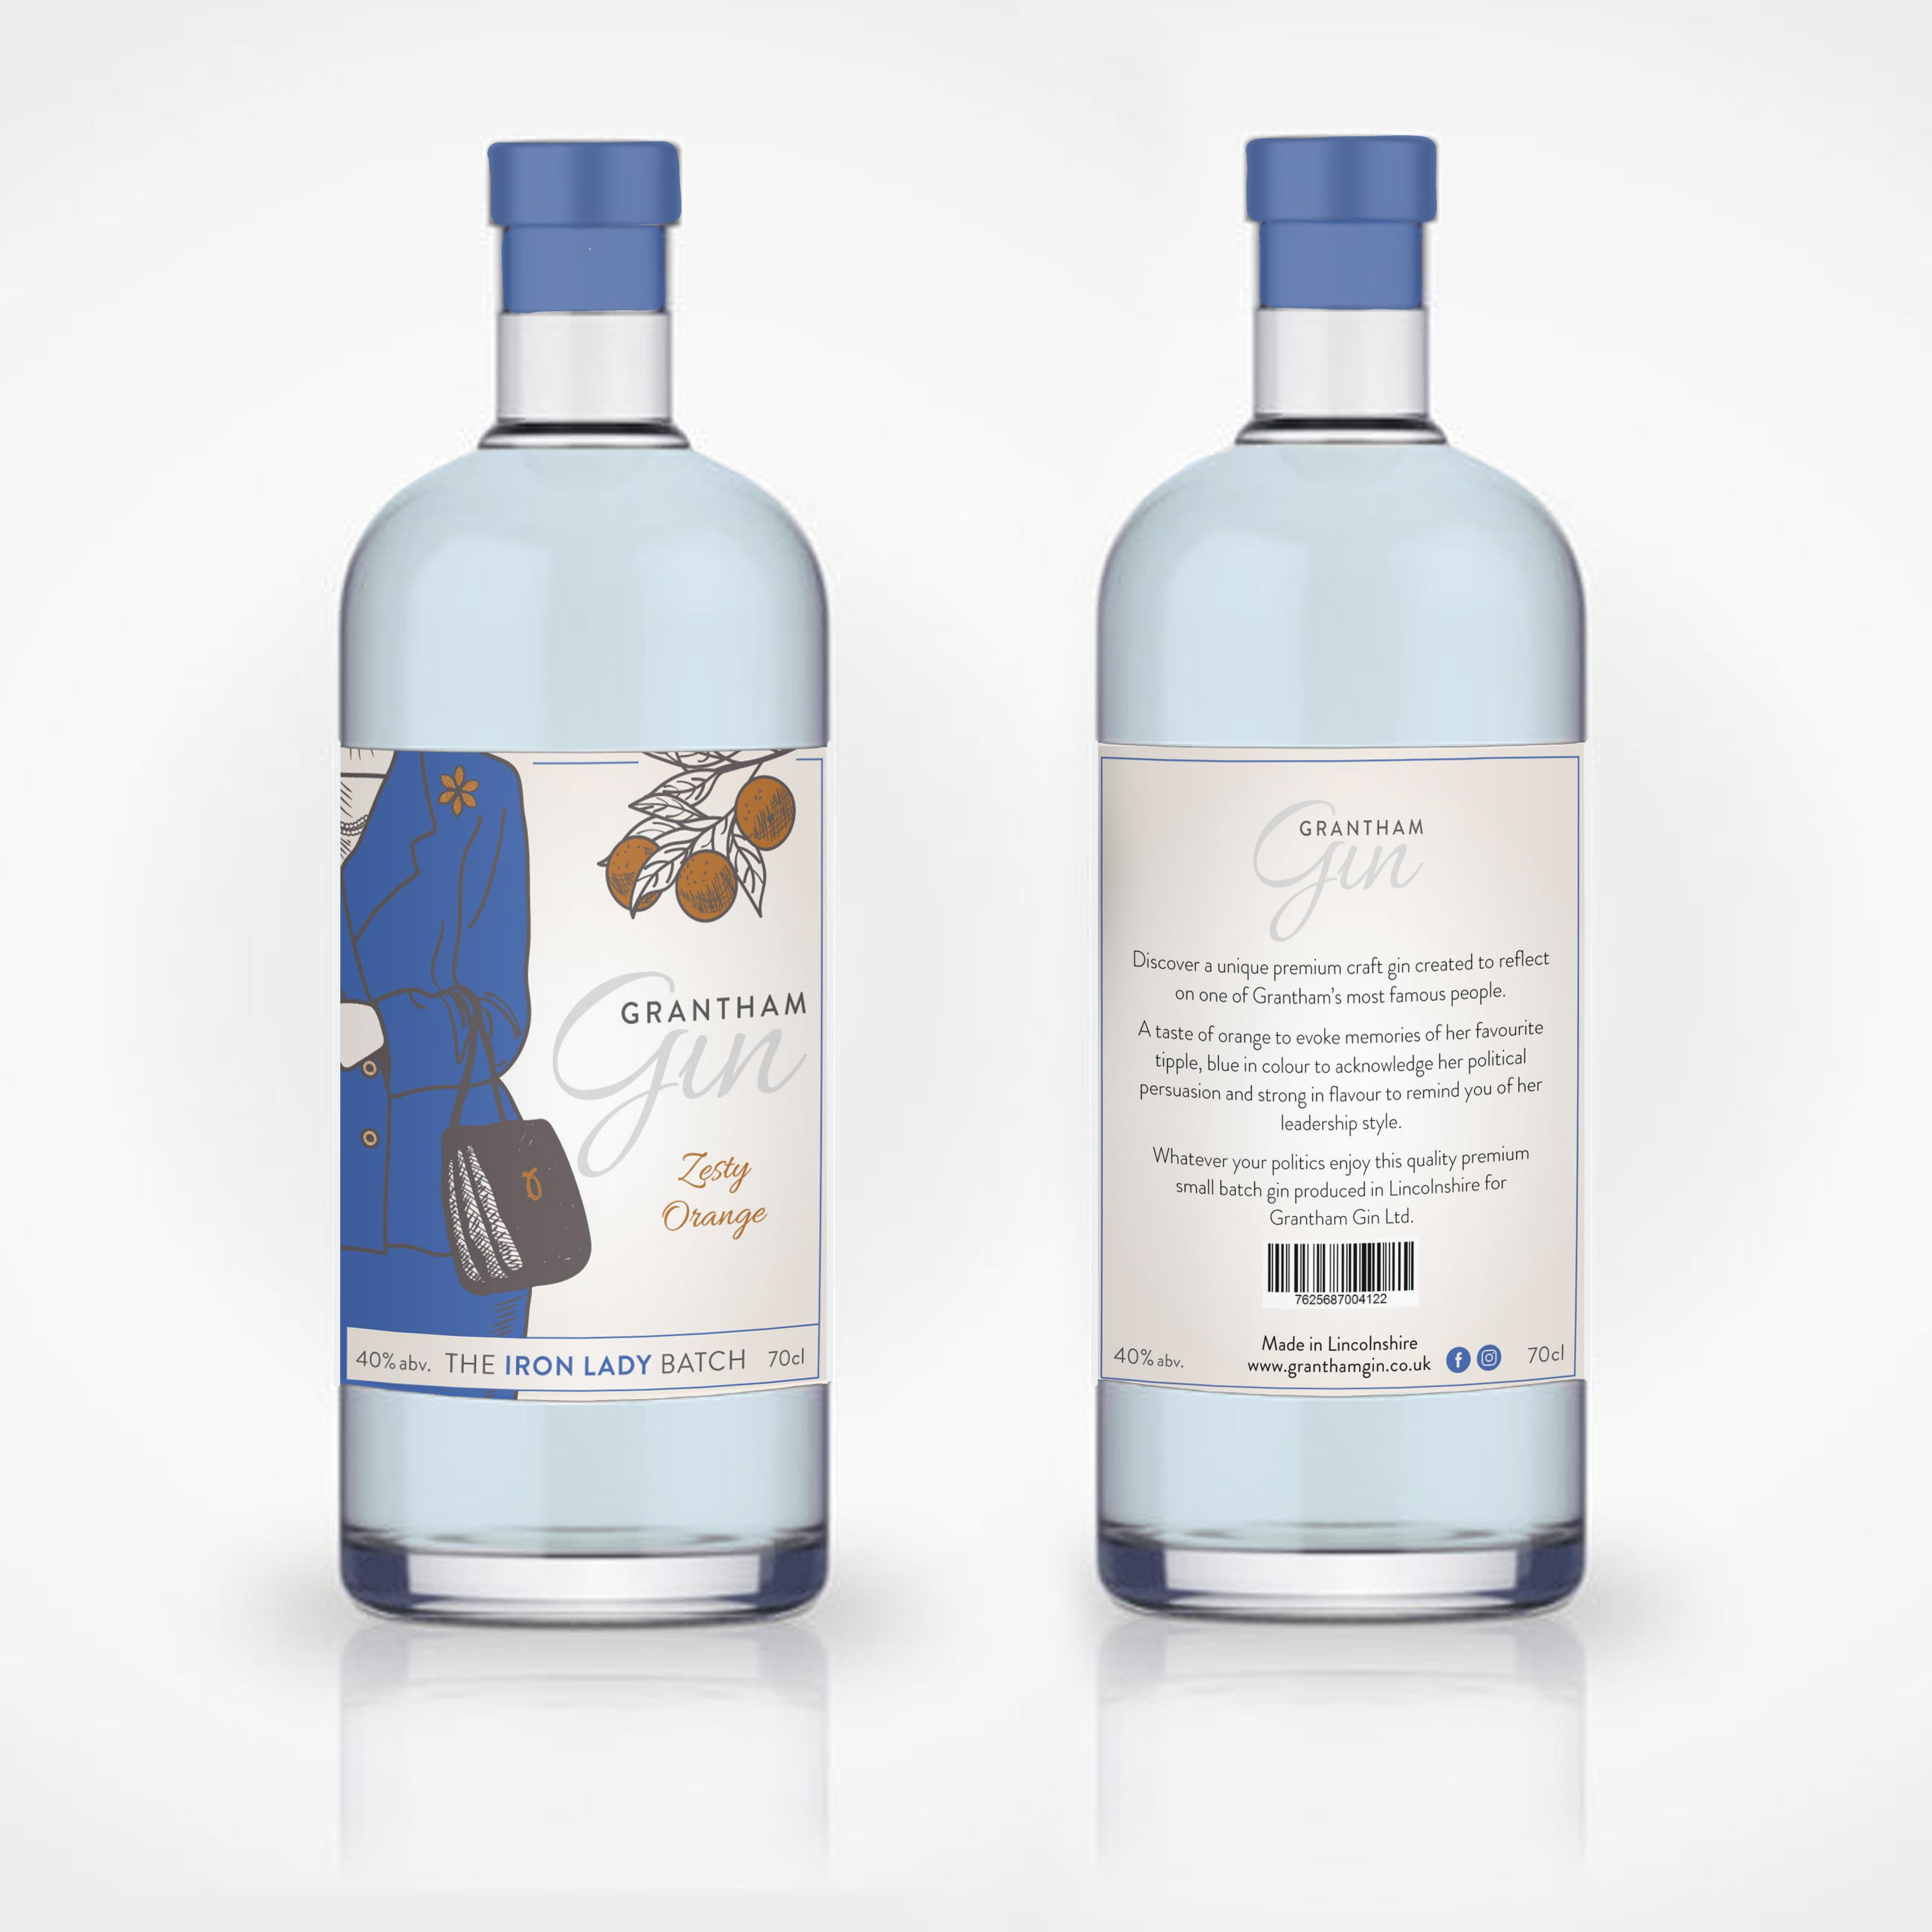 Iron Lady Grantham Gin Label Design